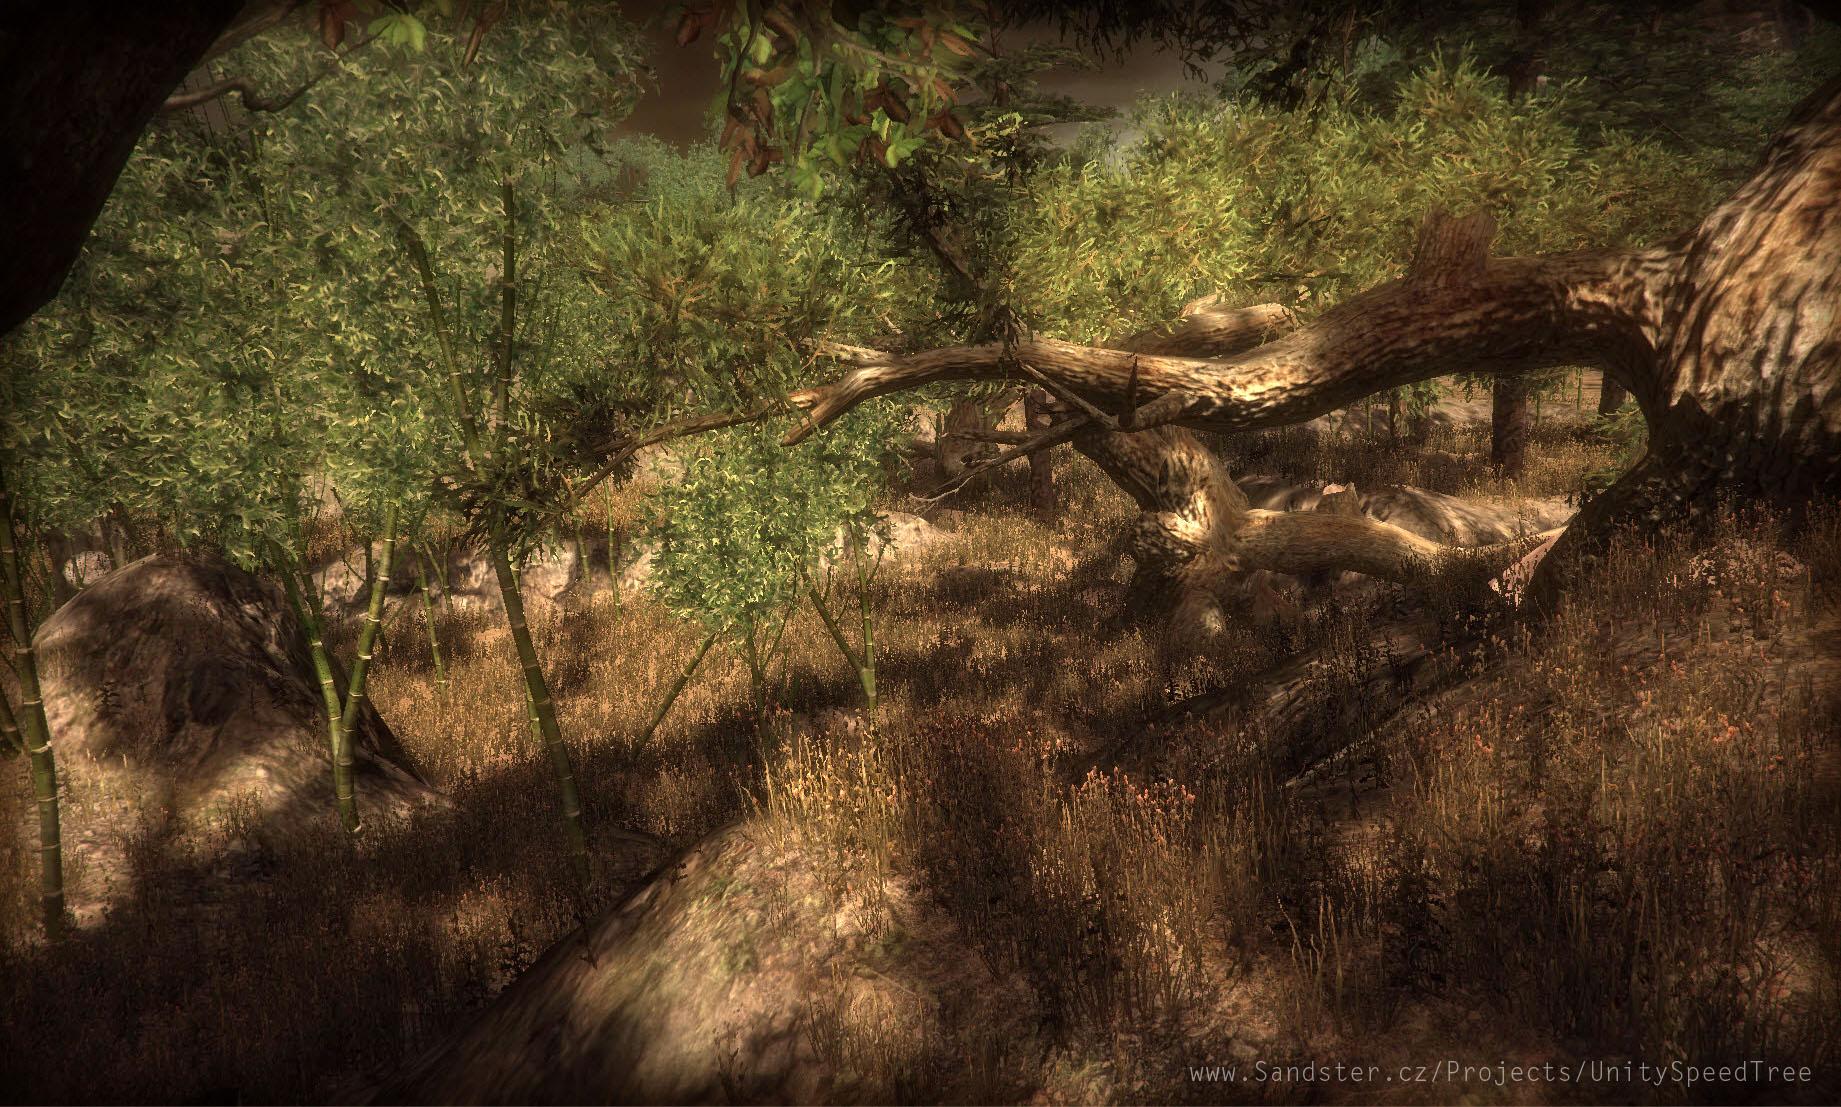 Replacing Unity trees with SpeedTree